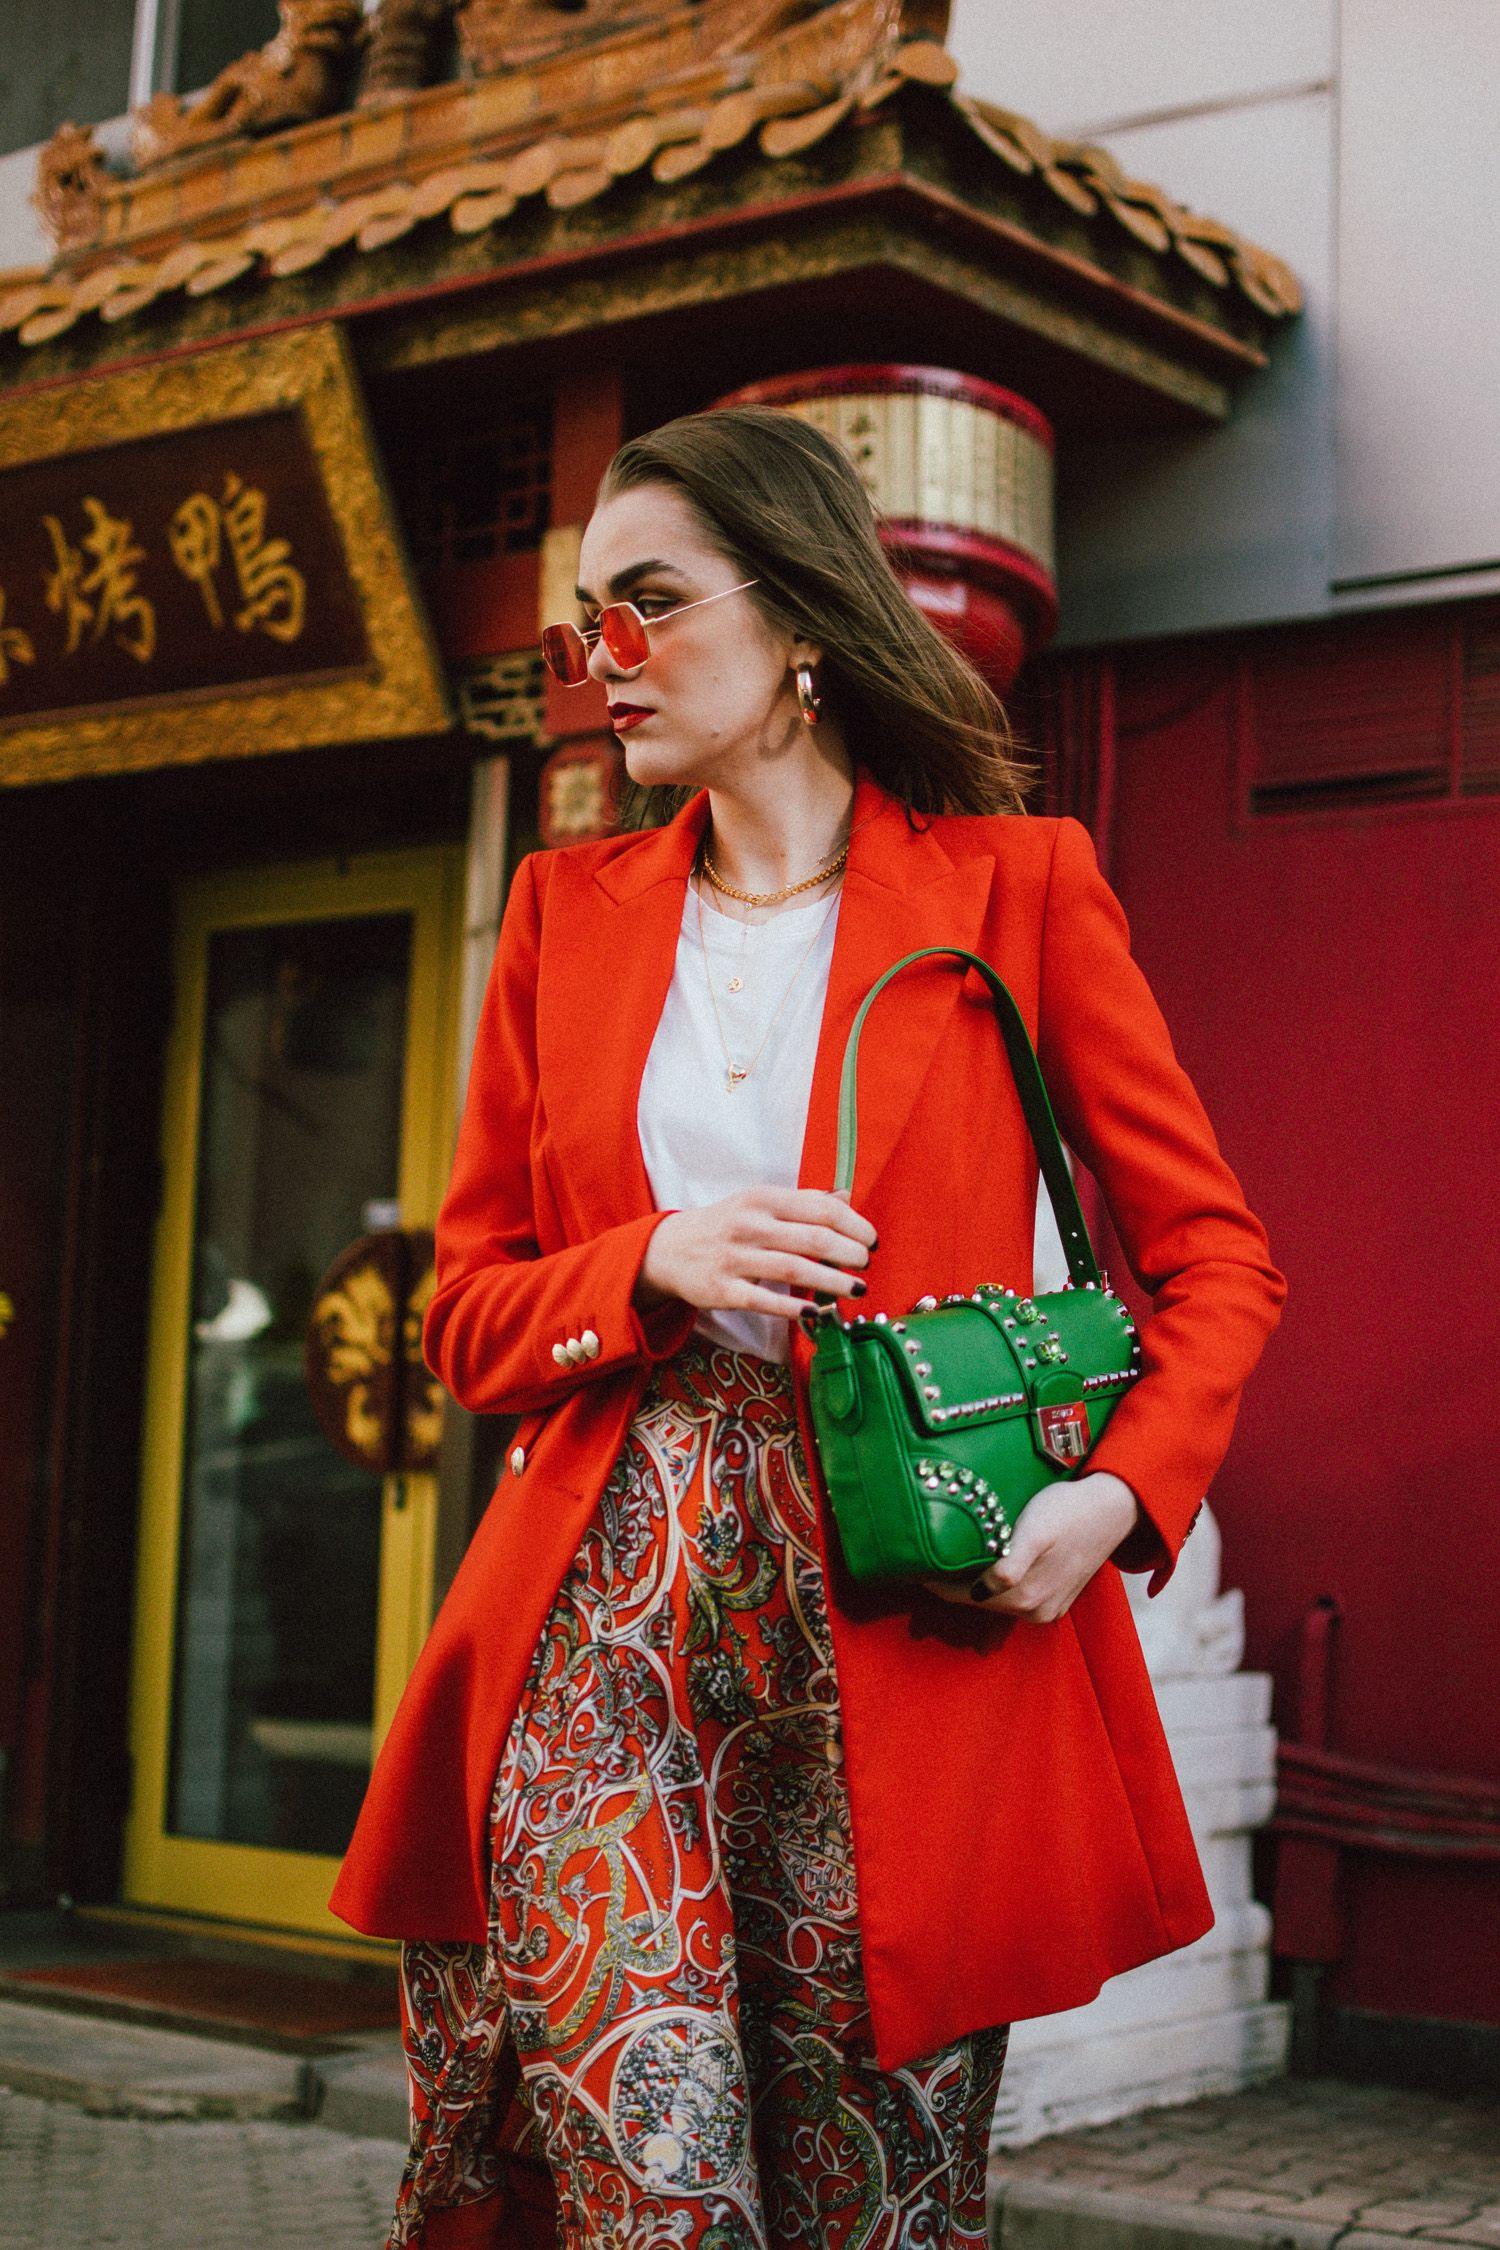 331e617f1a81 Cute Spring Outfits · Zara double breasted long orange blazer, h&m patterned  orange asymmetric midi skirt, gucci white